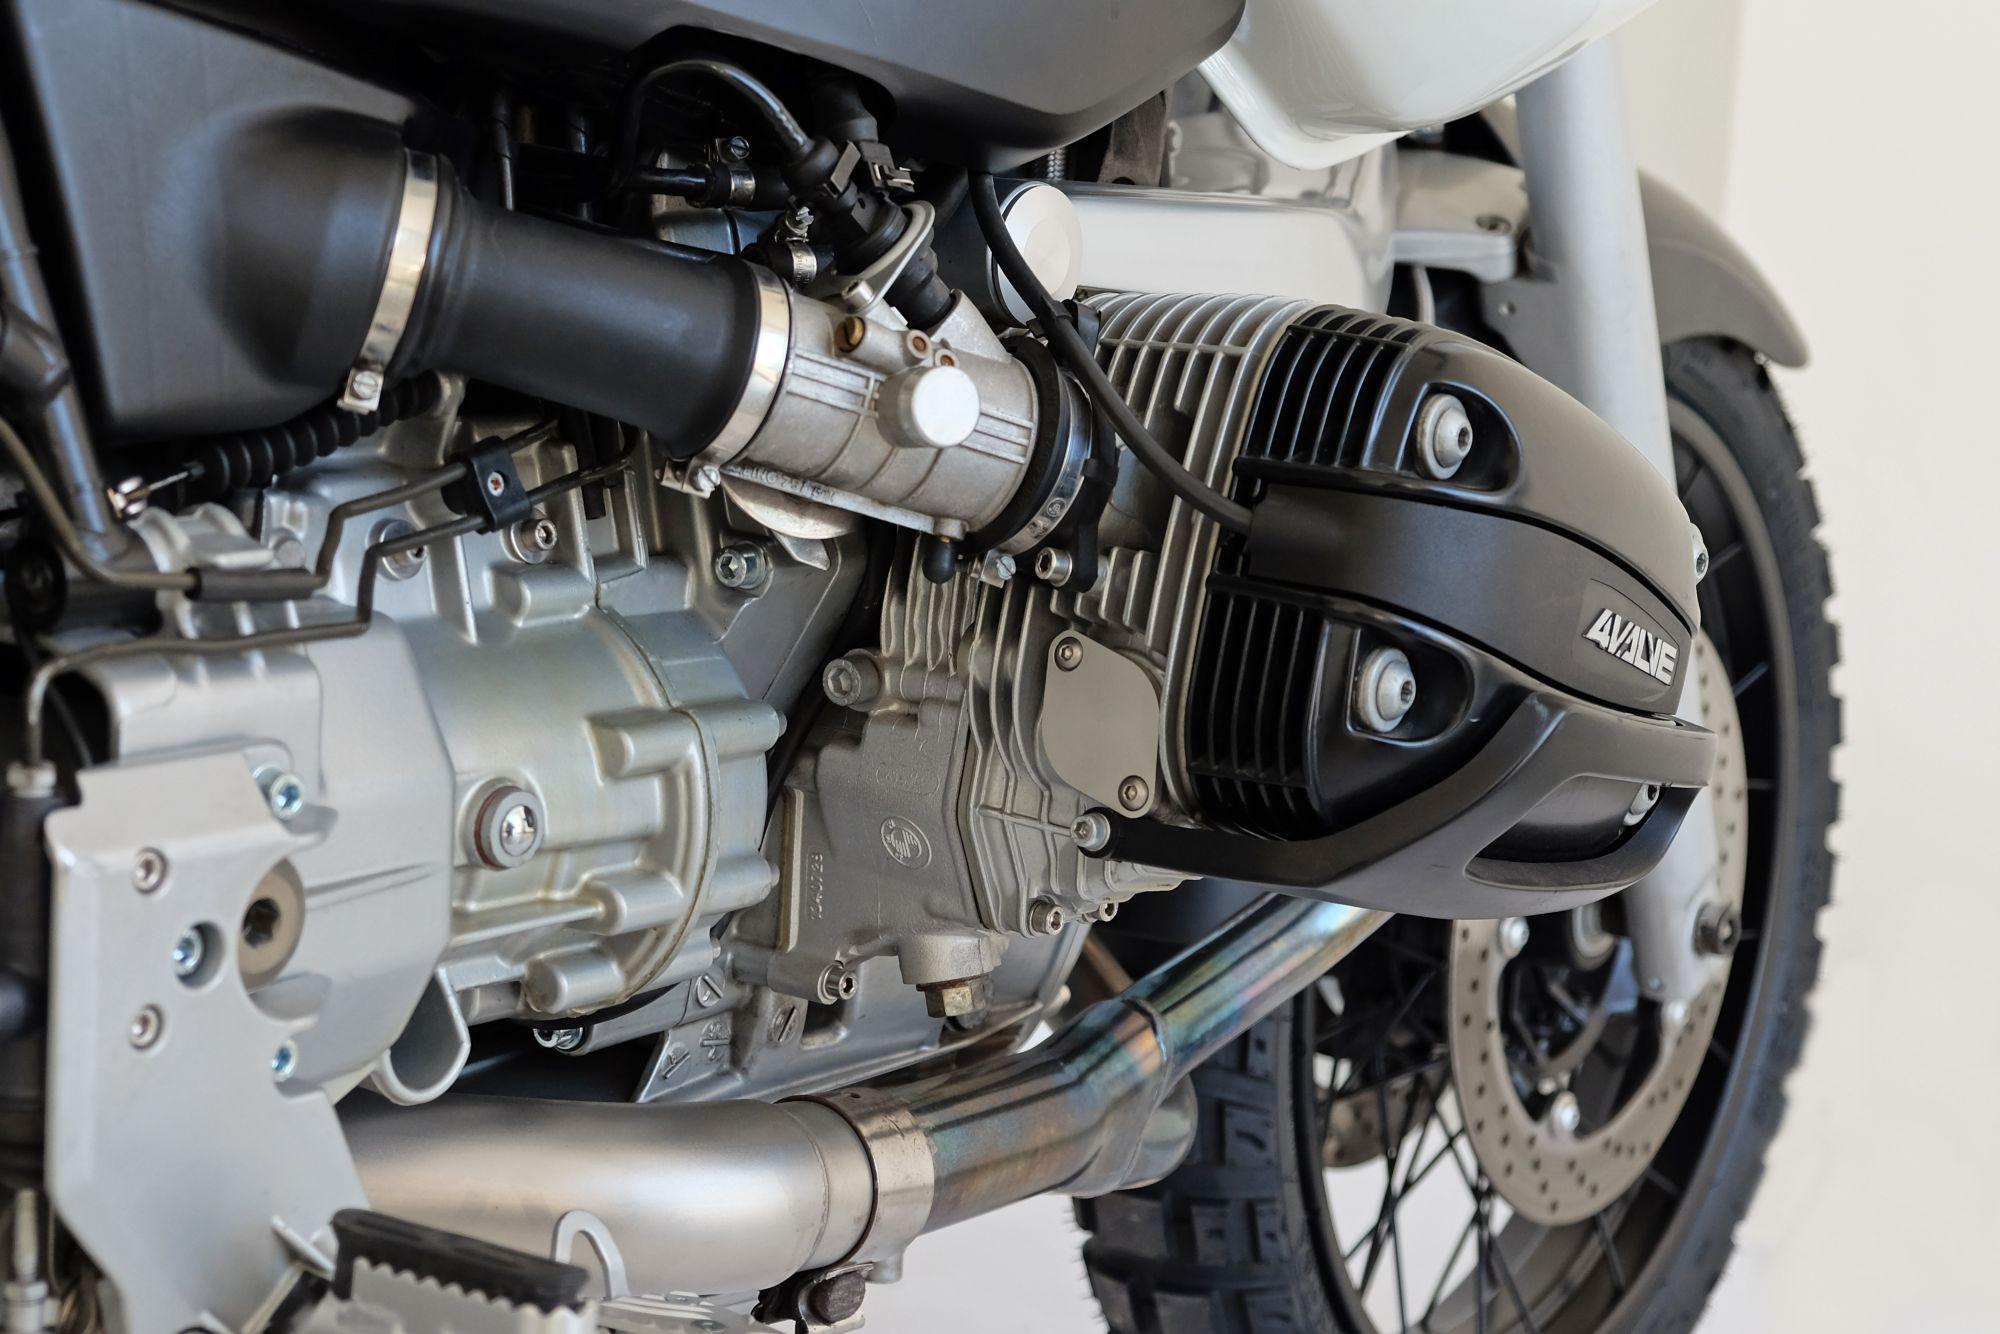 hornig bmw r 1100 gs scrambler umbau 2015 motorrad fotos. Black Bedroom Furniture Sets. Home Design Ideas